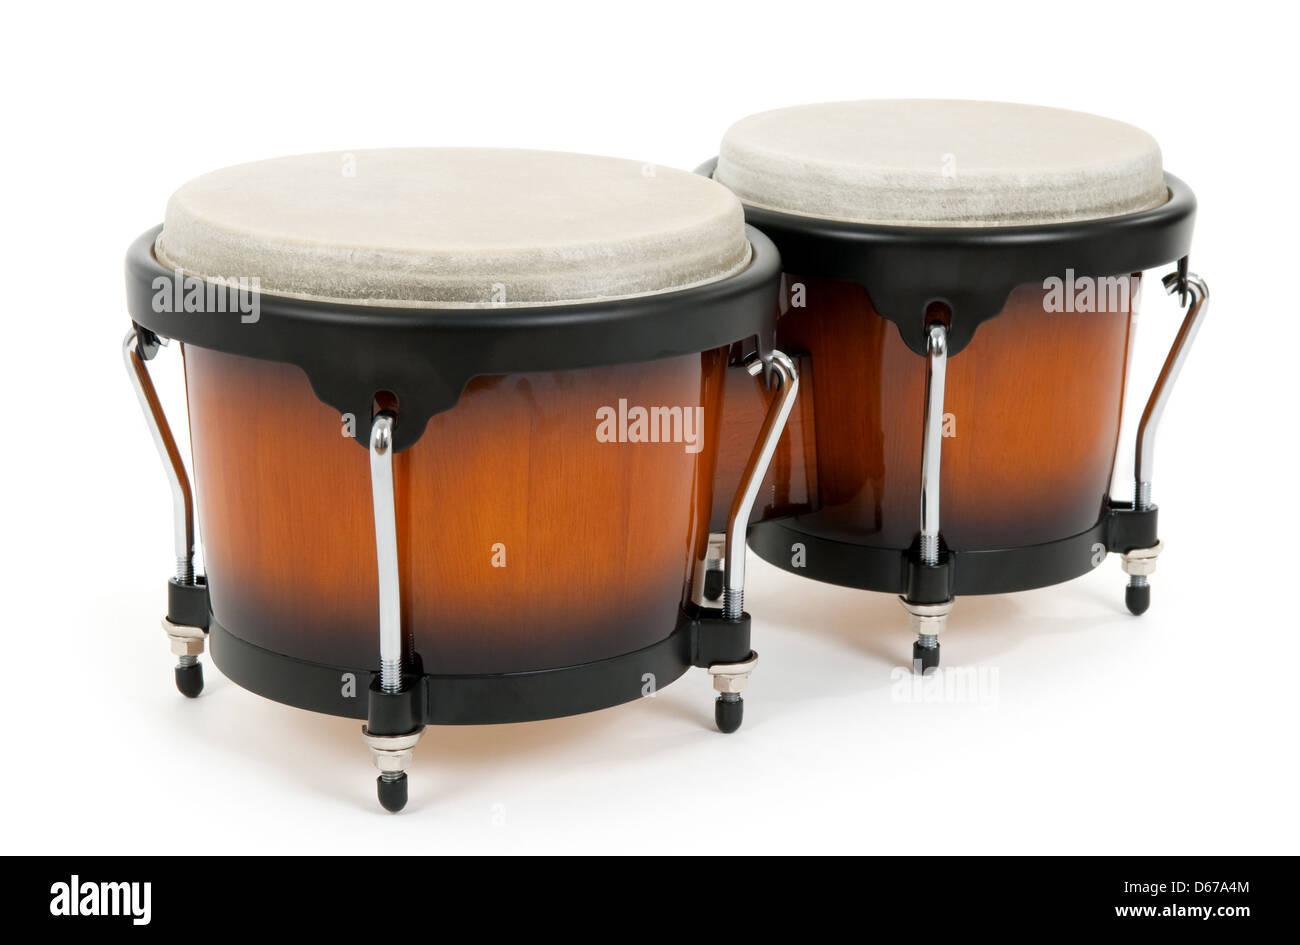 Tam Tam Instrument Stock Photos & Tam Tam Instrument Stock ...